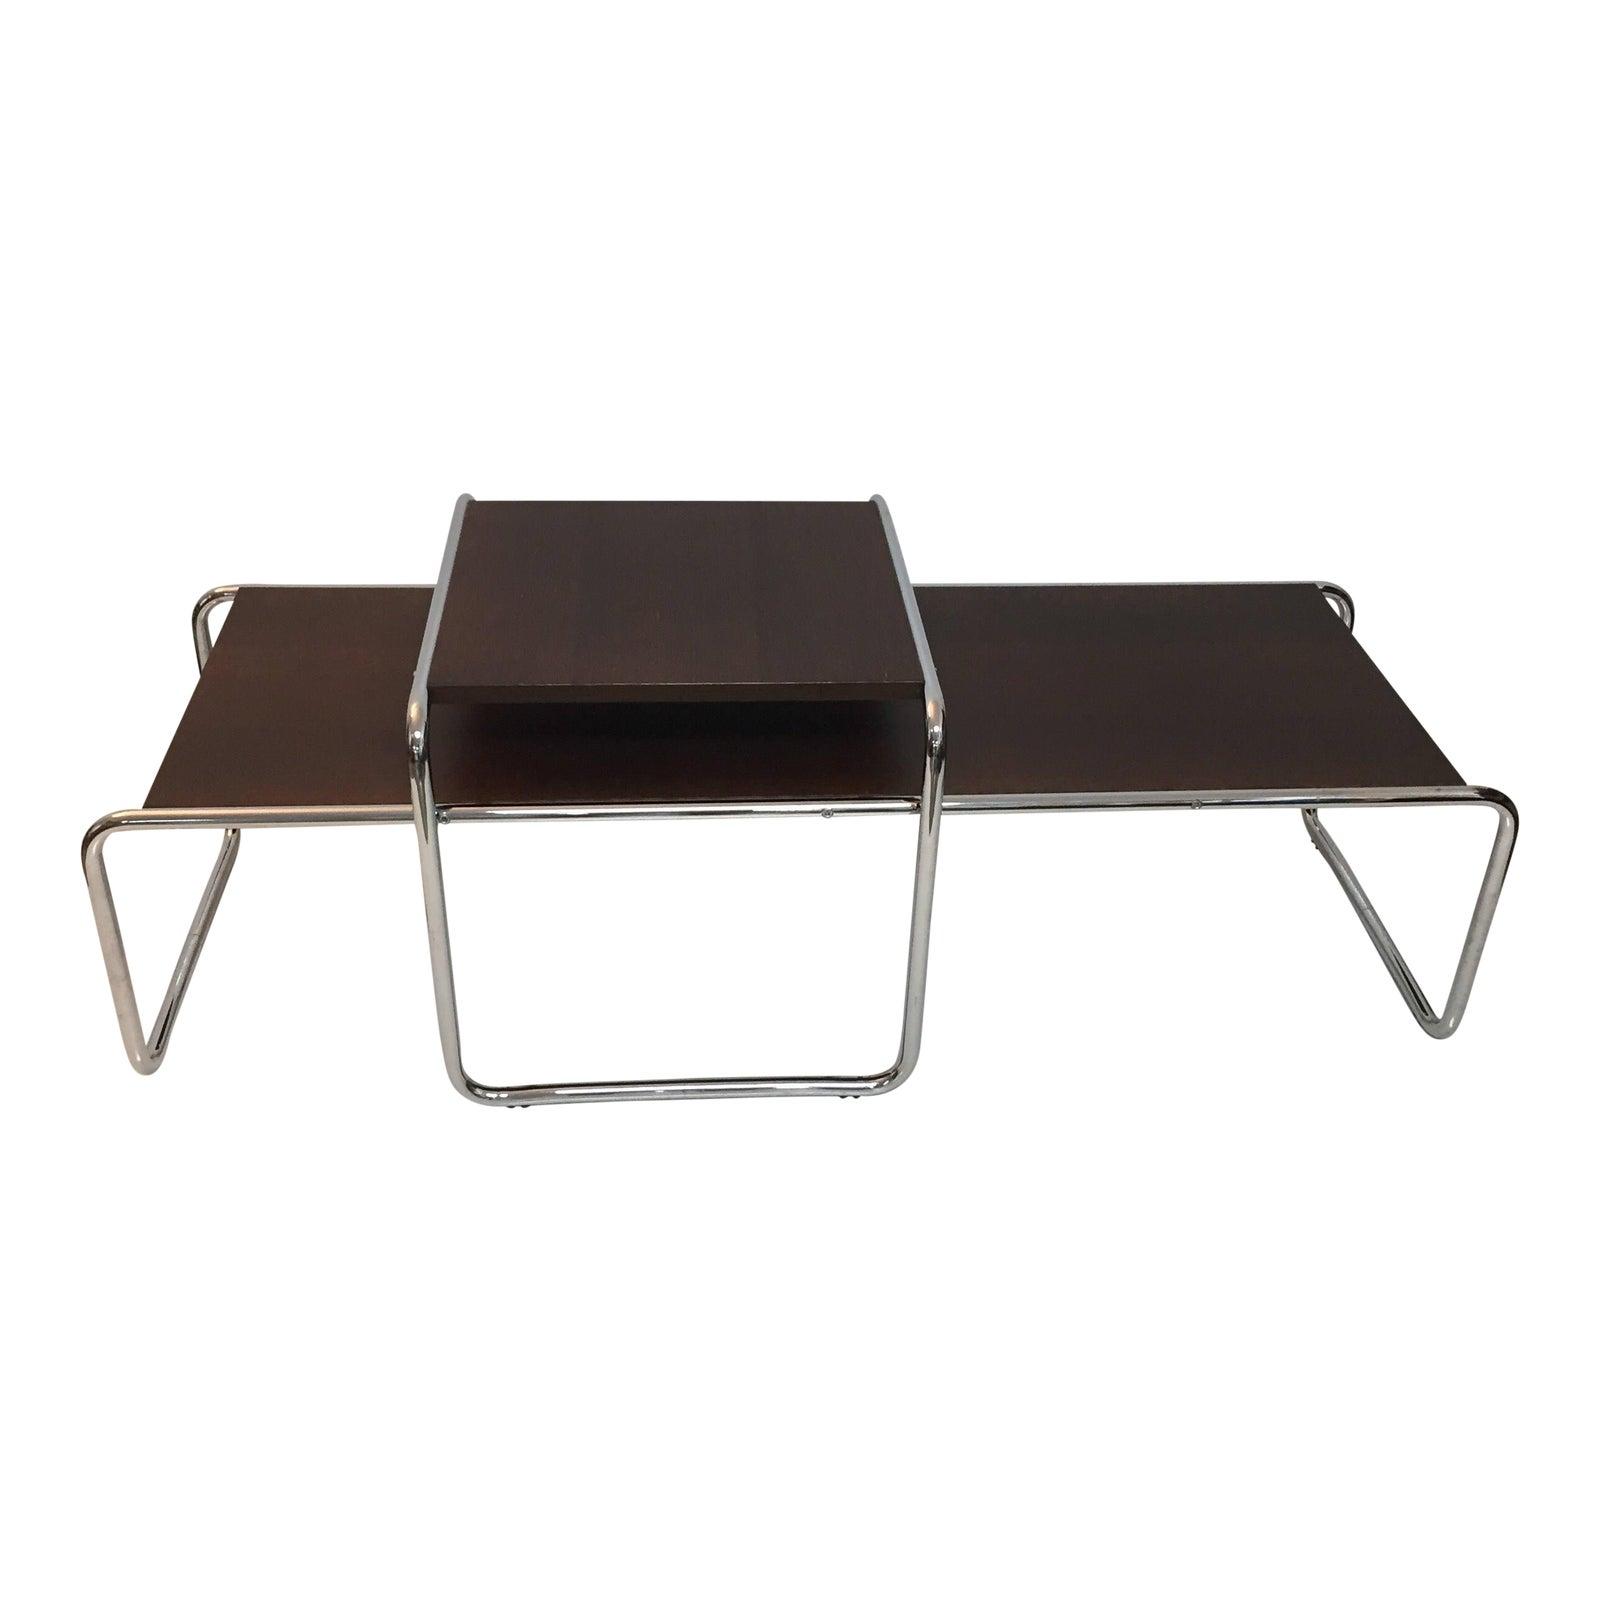 Tubular Steel Bauhaus Laccio Coffee Table Side A Pair Chairish